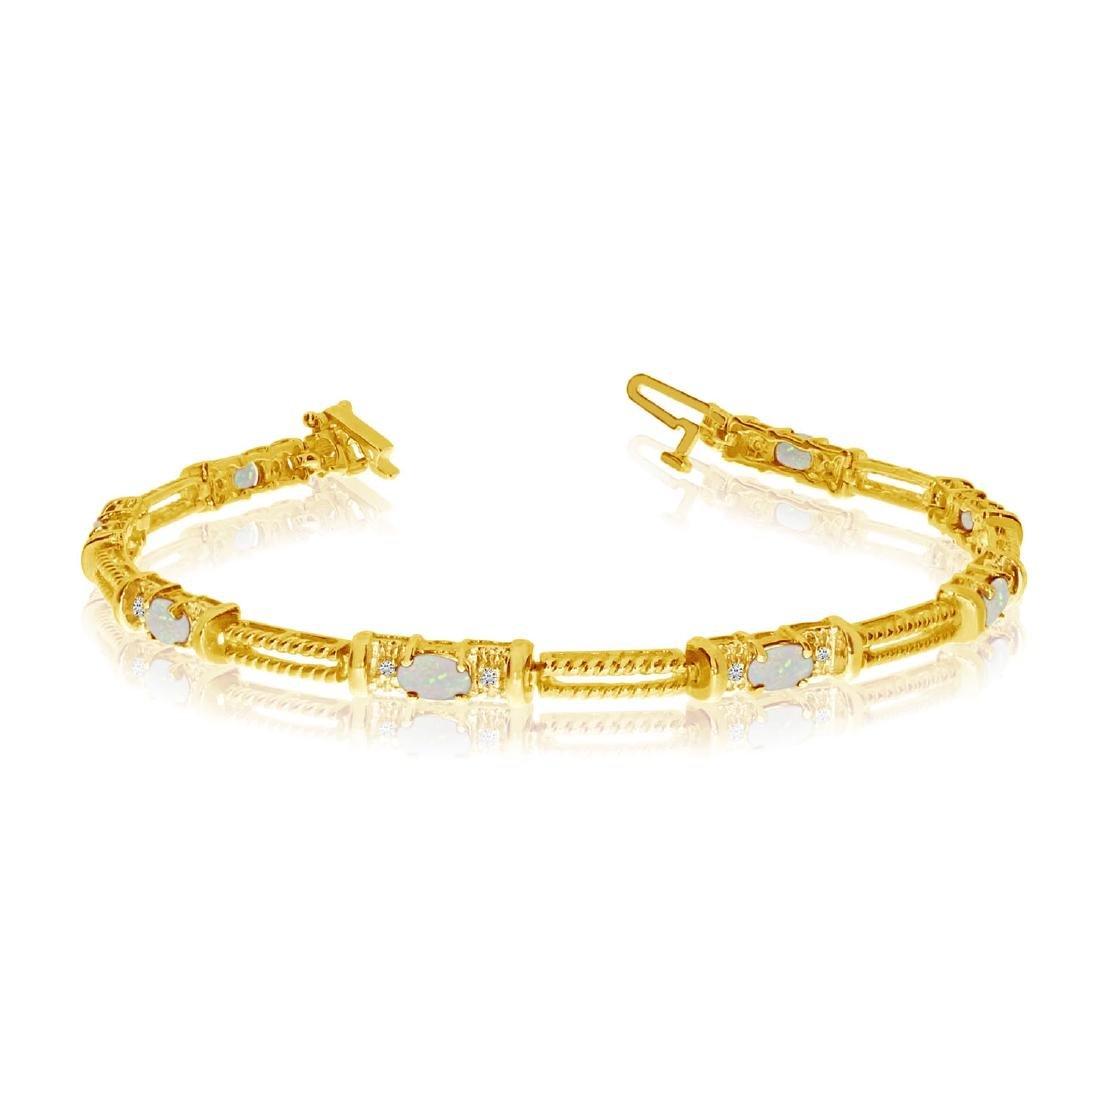 Certified 14k Yellow Gold Natural Opal And Diamond Tenn